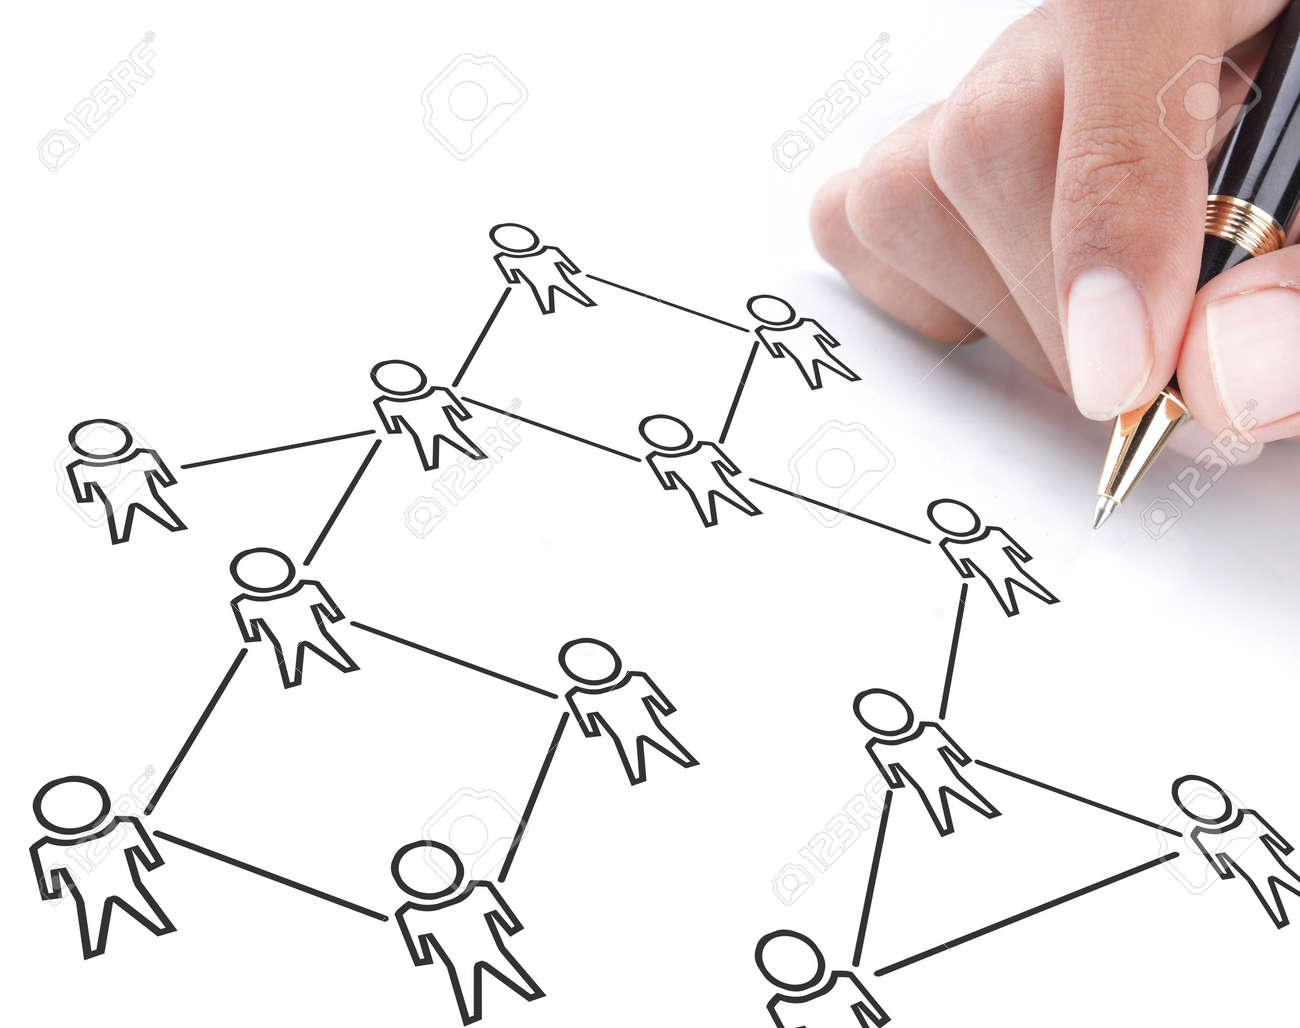 social networking concept drawn on white board Standard-Bild - 11772425